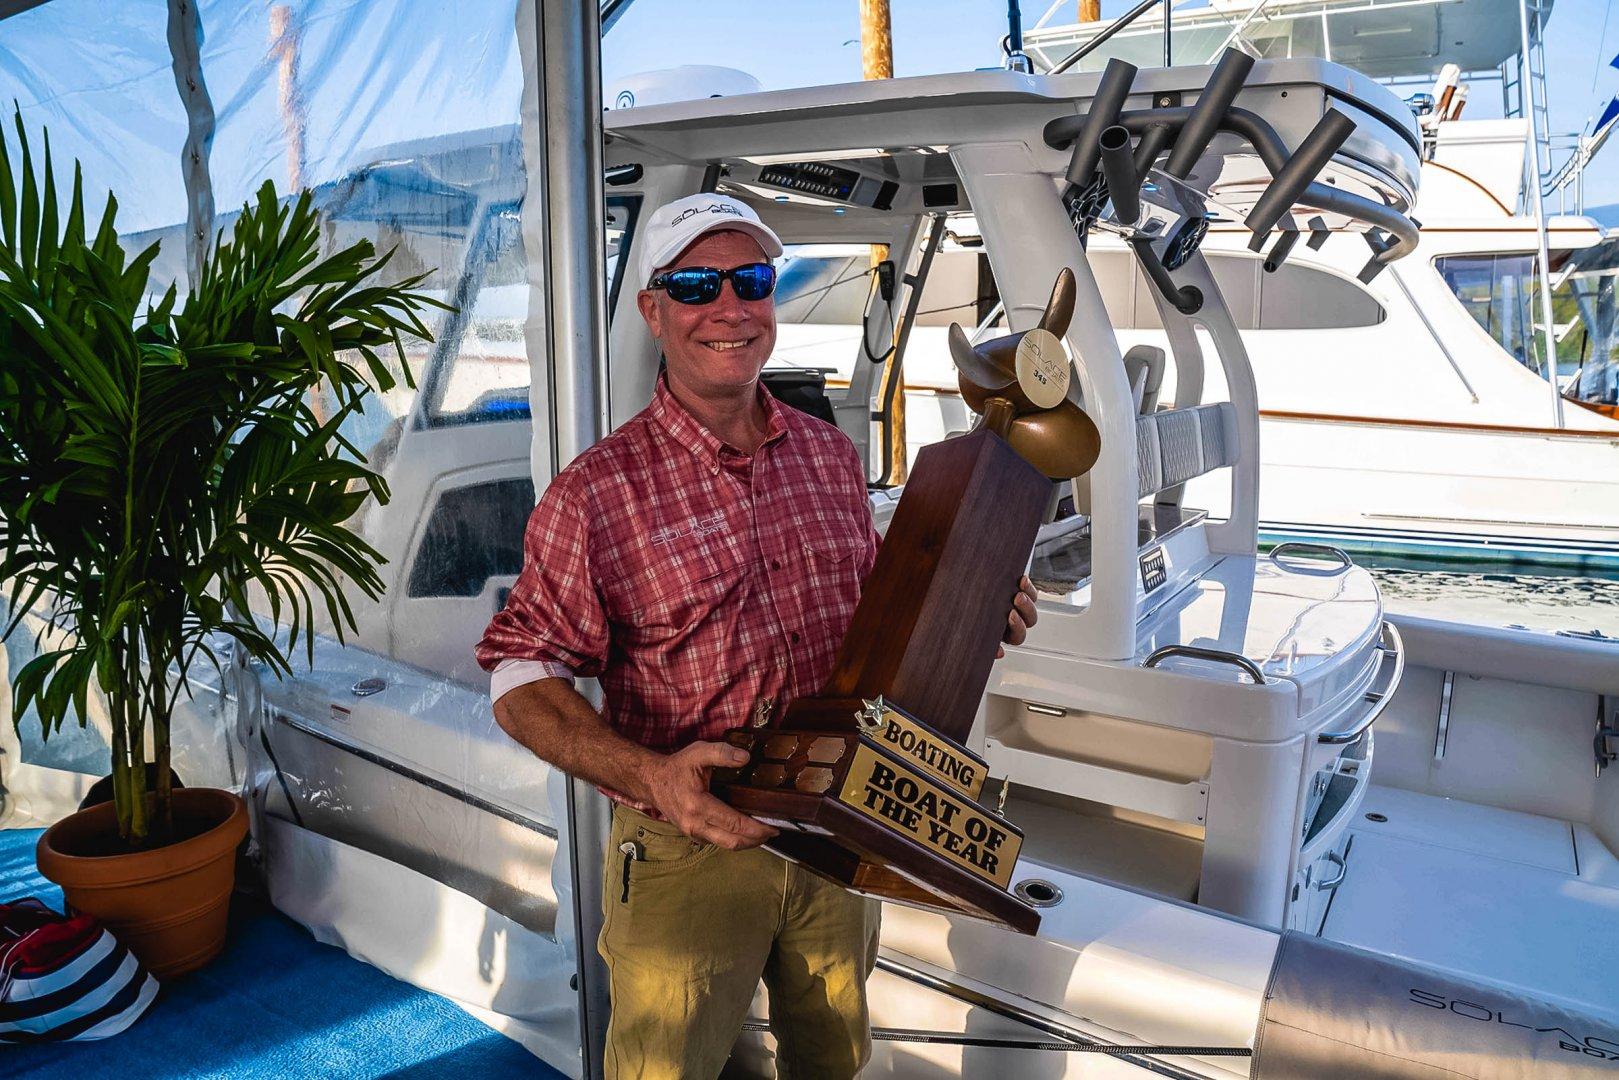 2 Sol Steve Dougherty 345 Boat of the Year_web_size.jpg